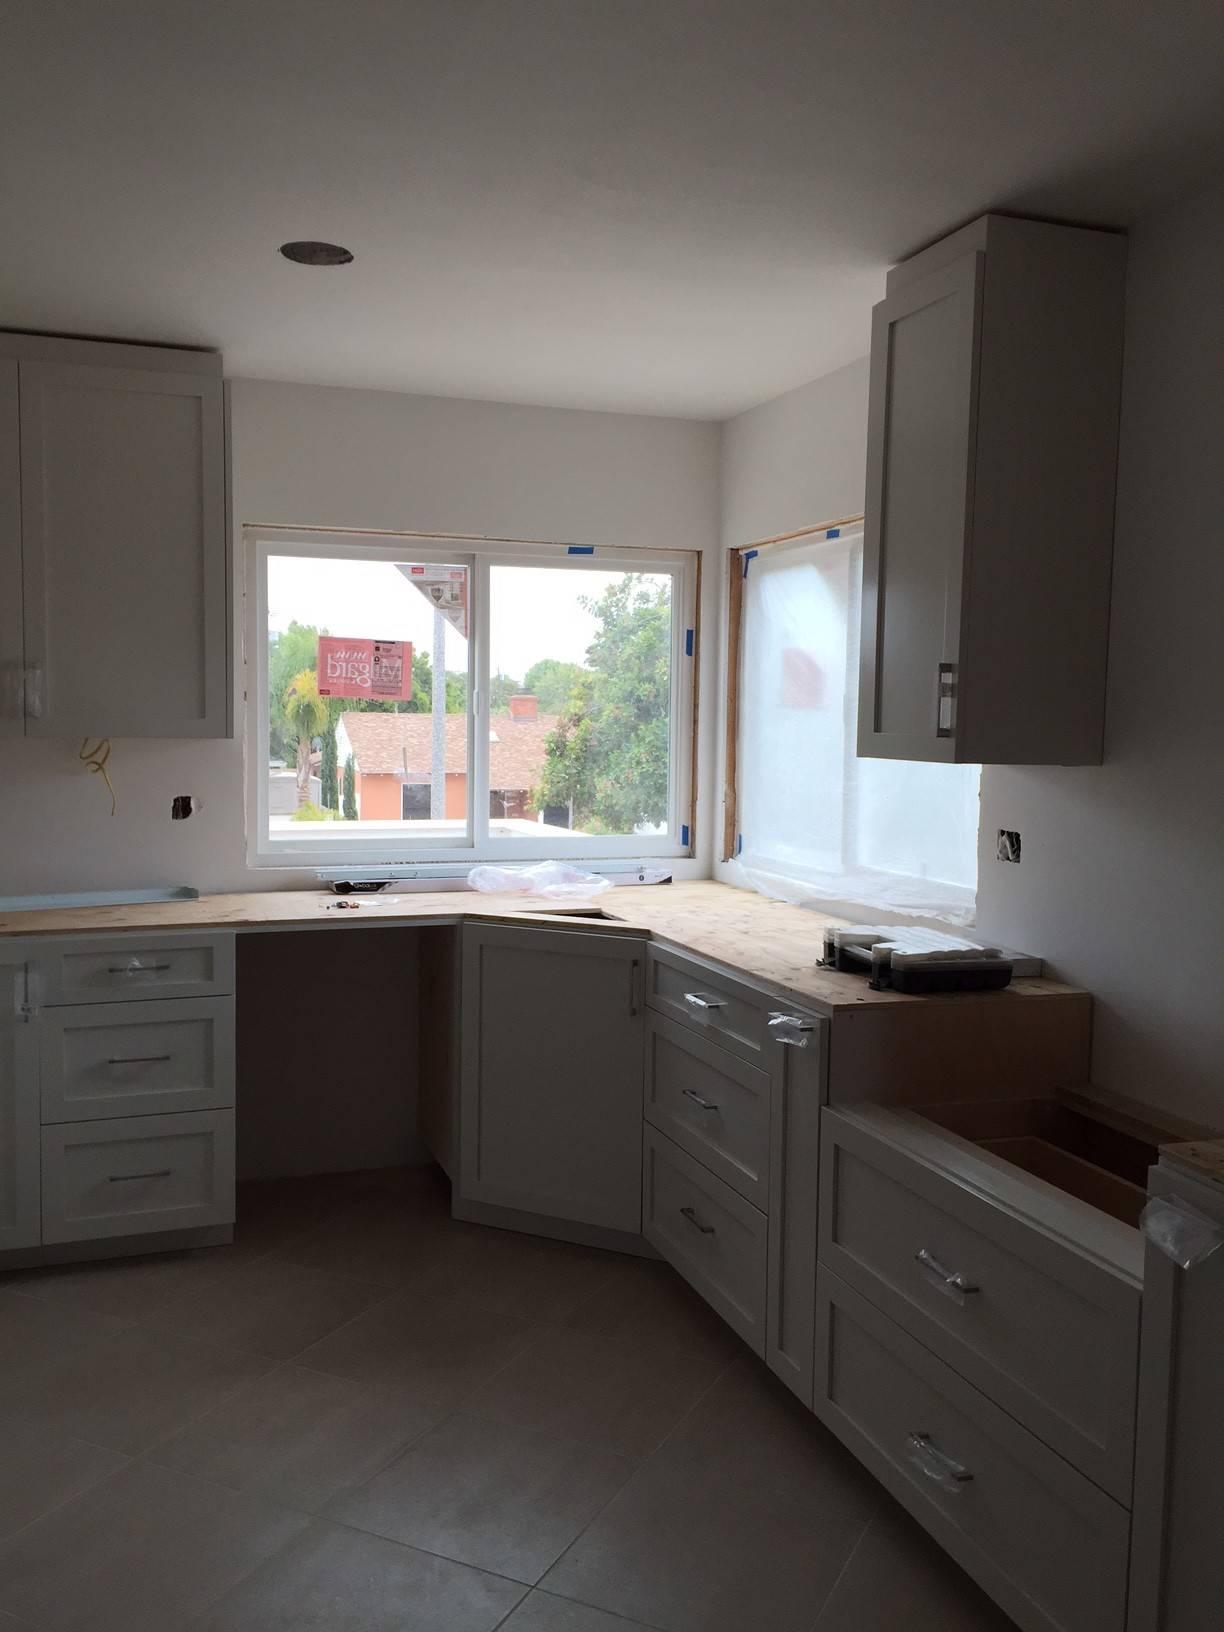 Kitchen during remodeling